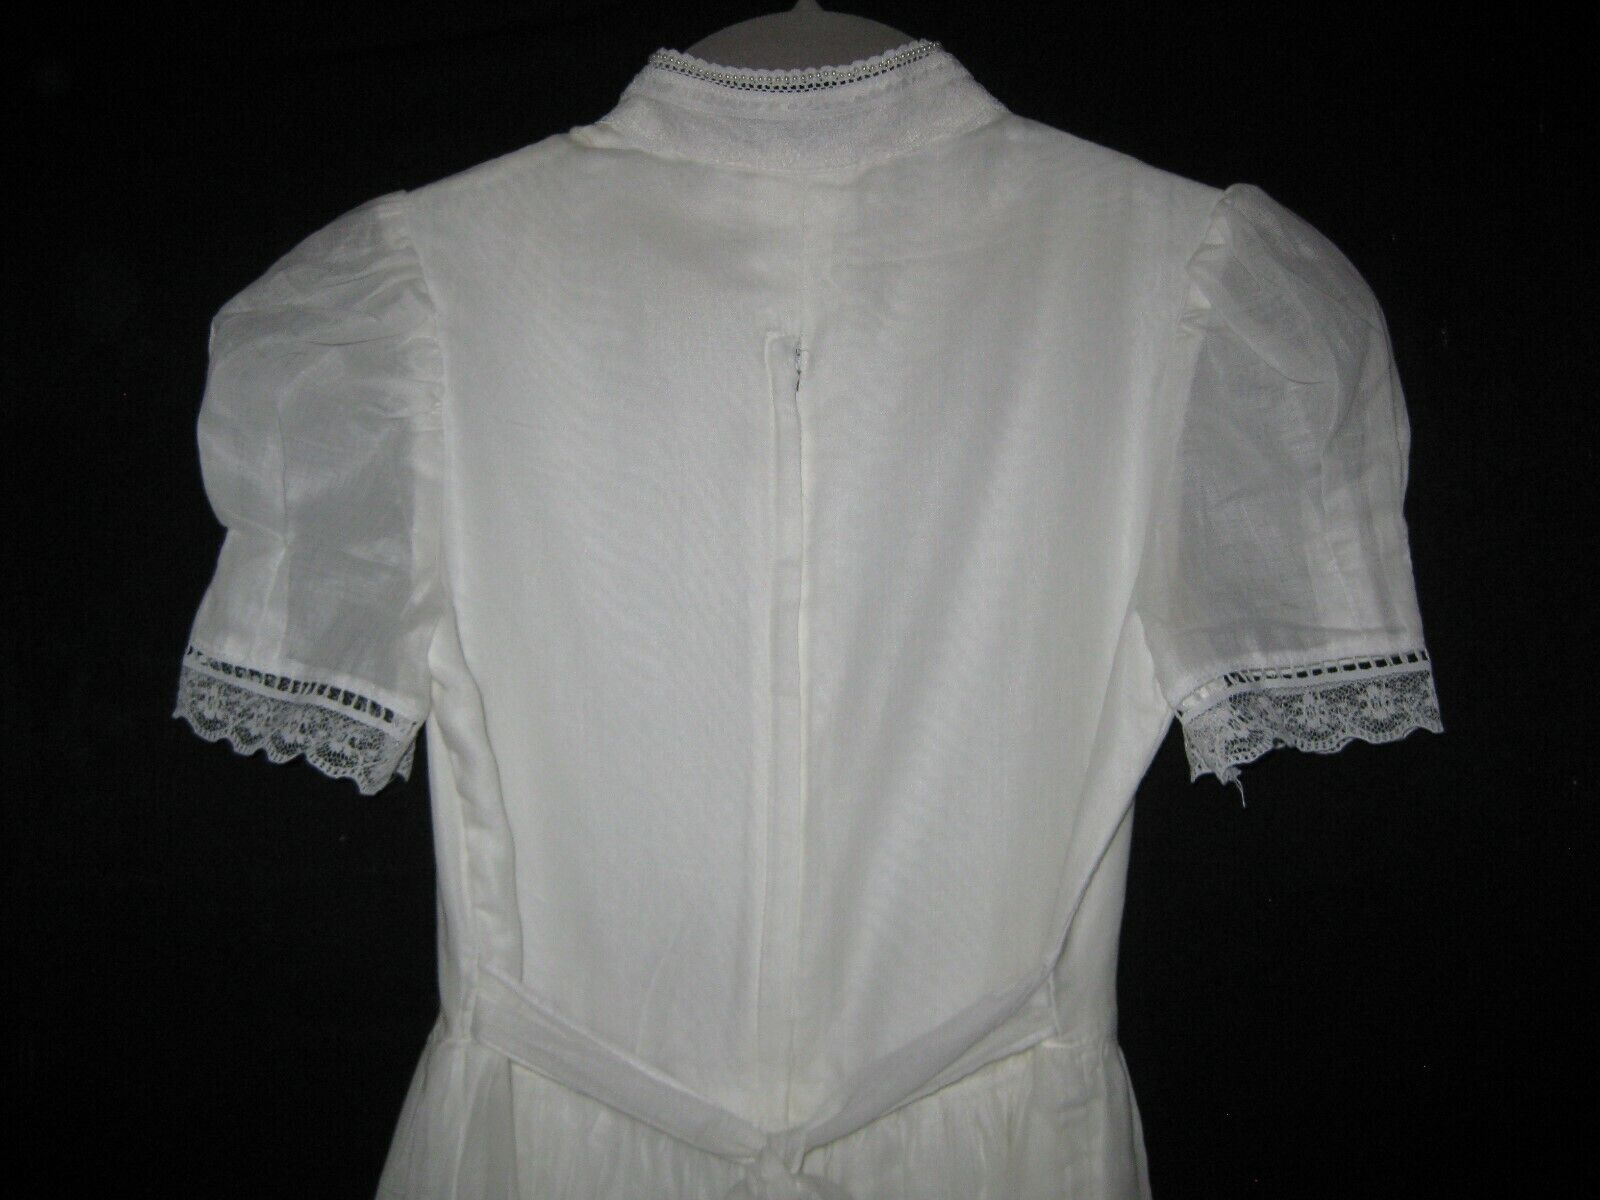 Gunne Sax White Dress Girls Size 12 Pre-Owned - image 7